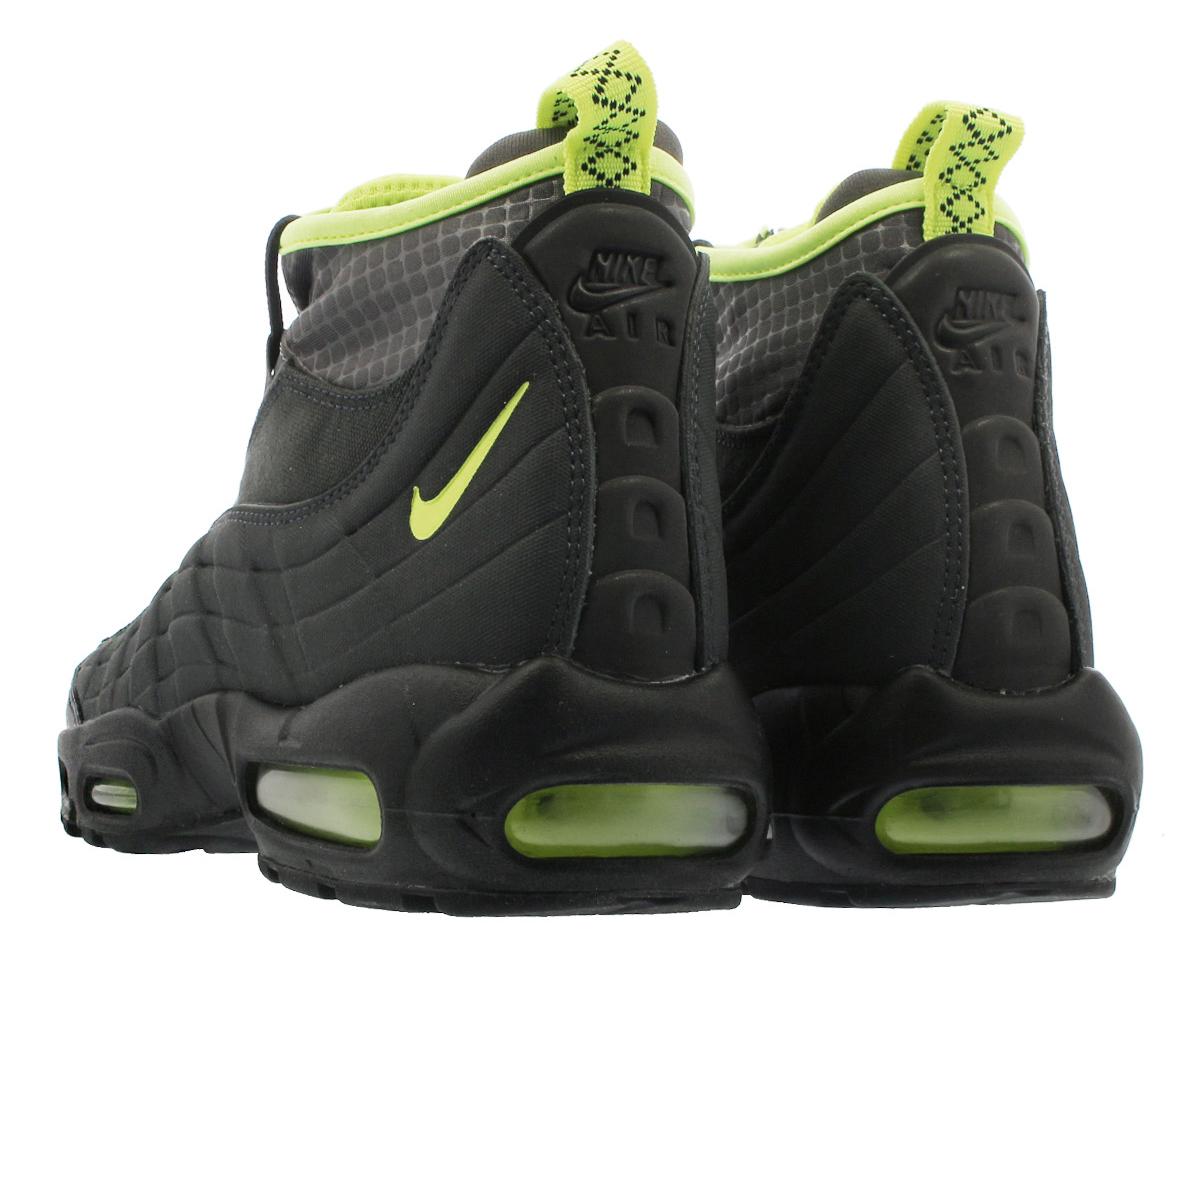 70768282c0 ... NIKE AIR MAX 95 SNEAKERBOOT Kie Ney AMAX 95 sneakers boots  ANTHRACITE/VOLT/DARK ...